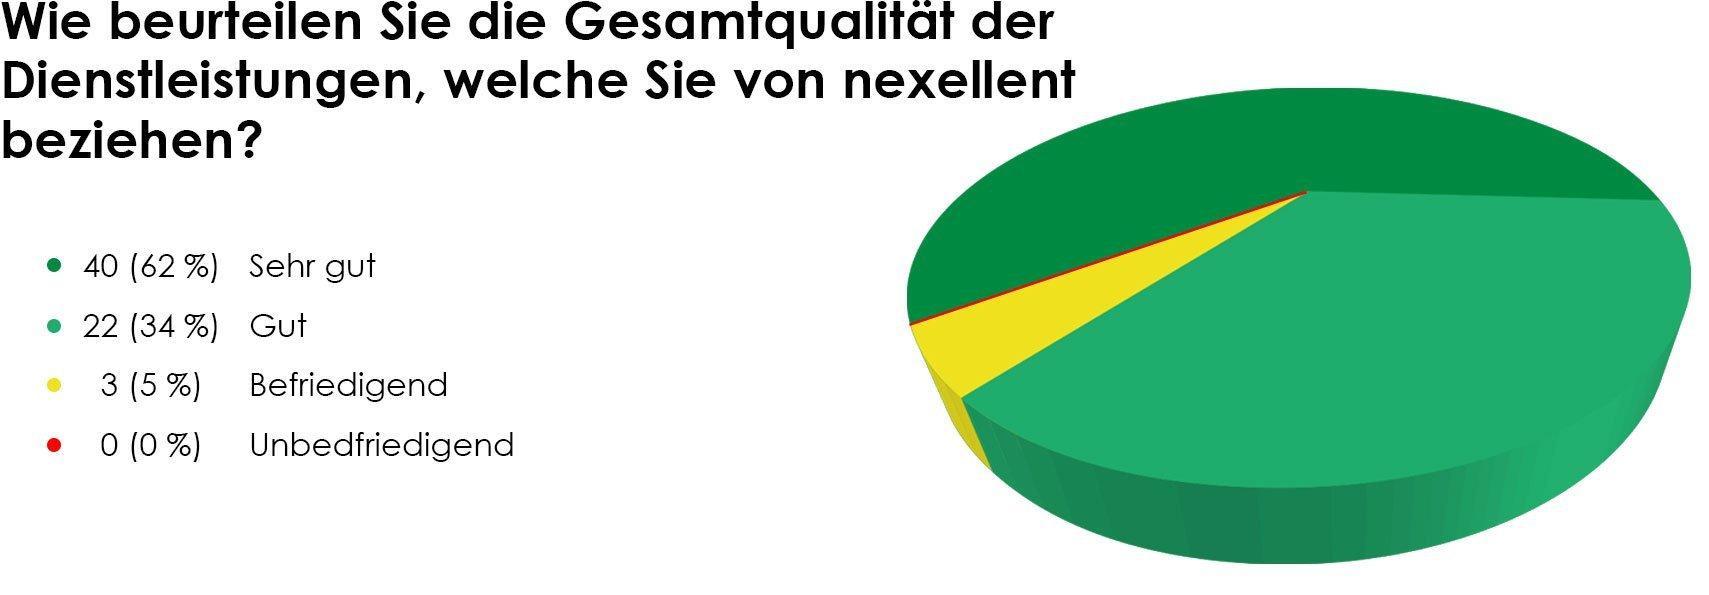 nexellent-umfrage-grafik